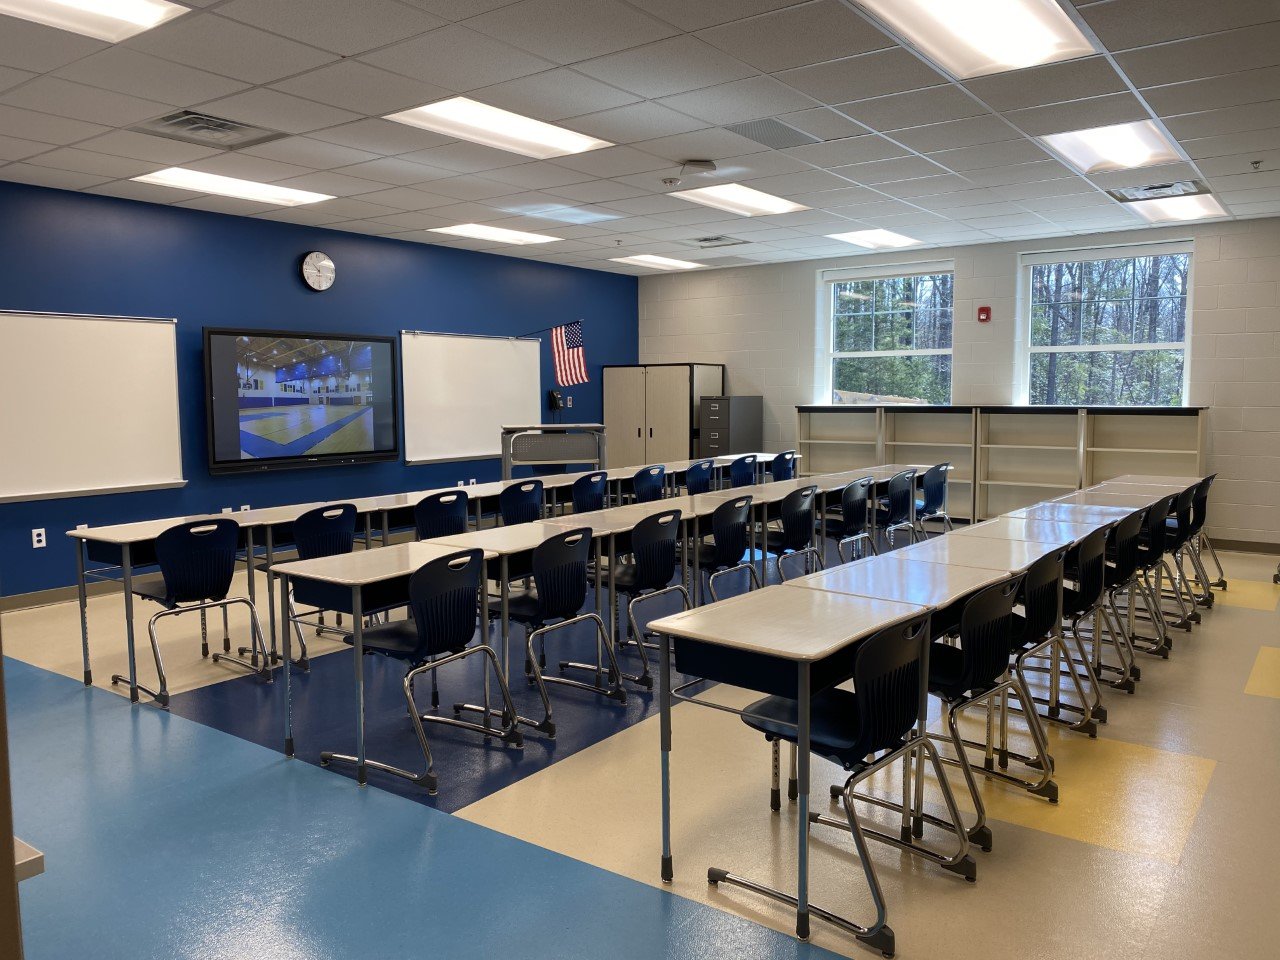 Crestwood Elementary School classroom